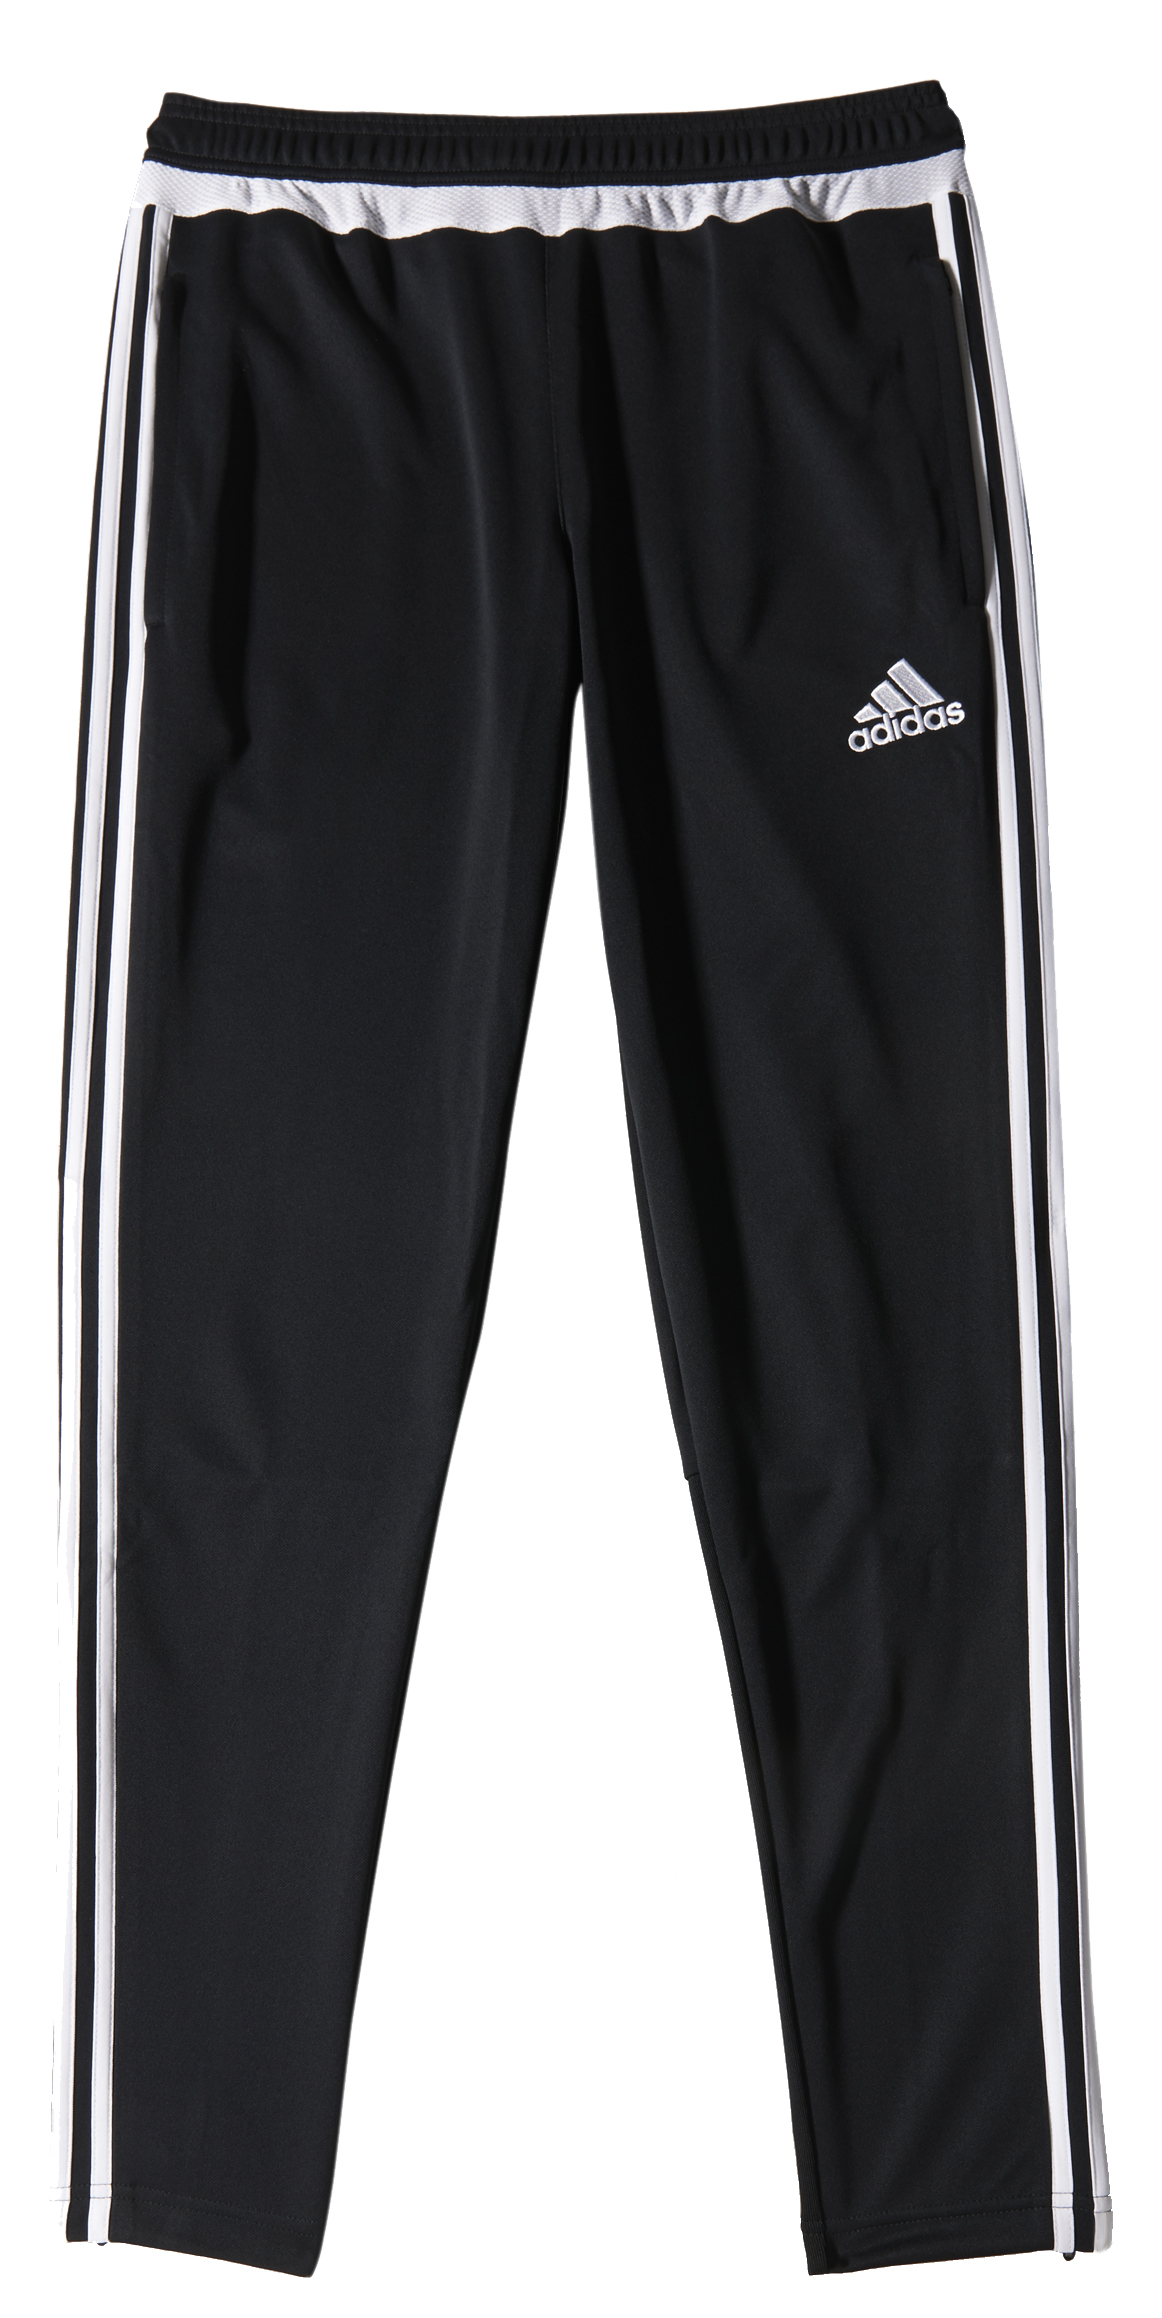 De Hommes Pantalon 15 Adidas Tiro 1cTKl3uFJ